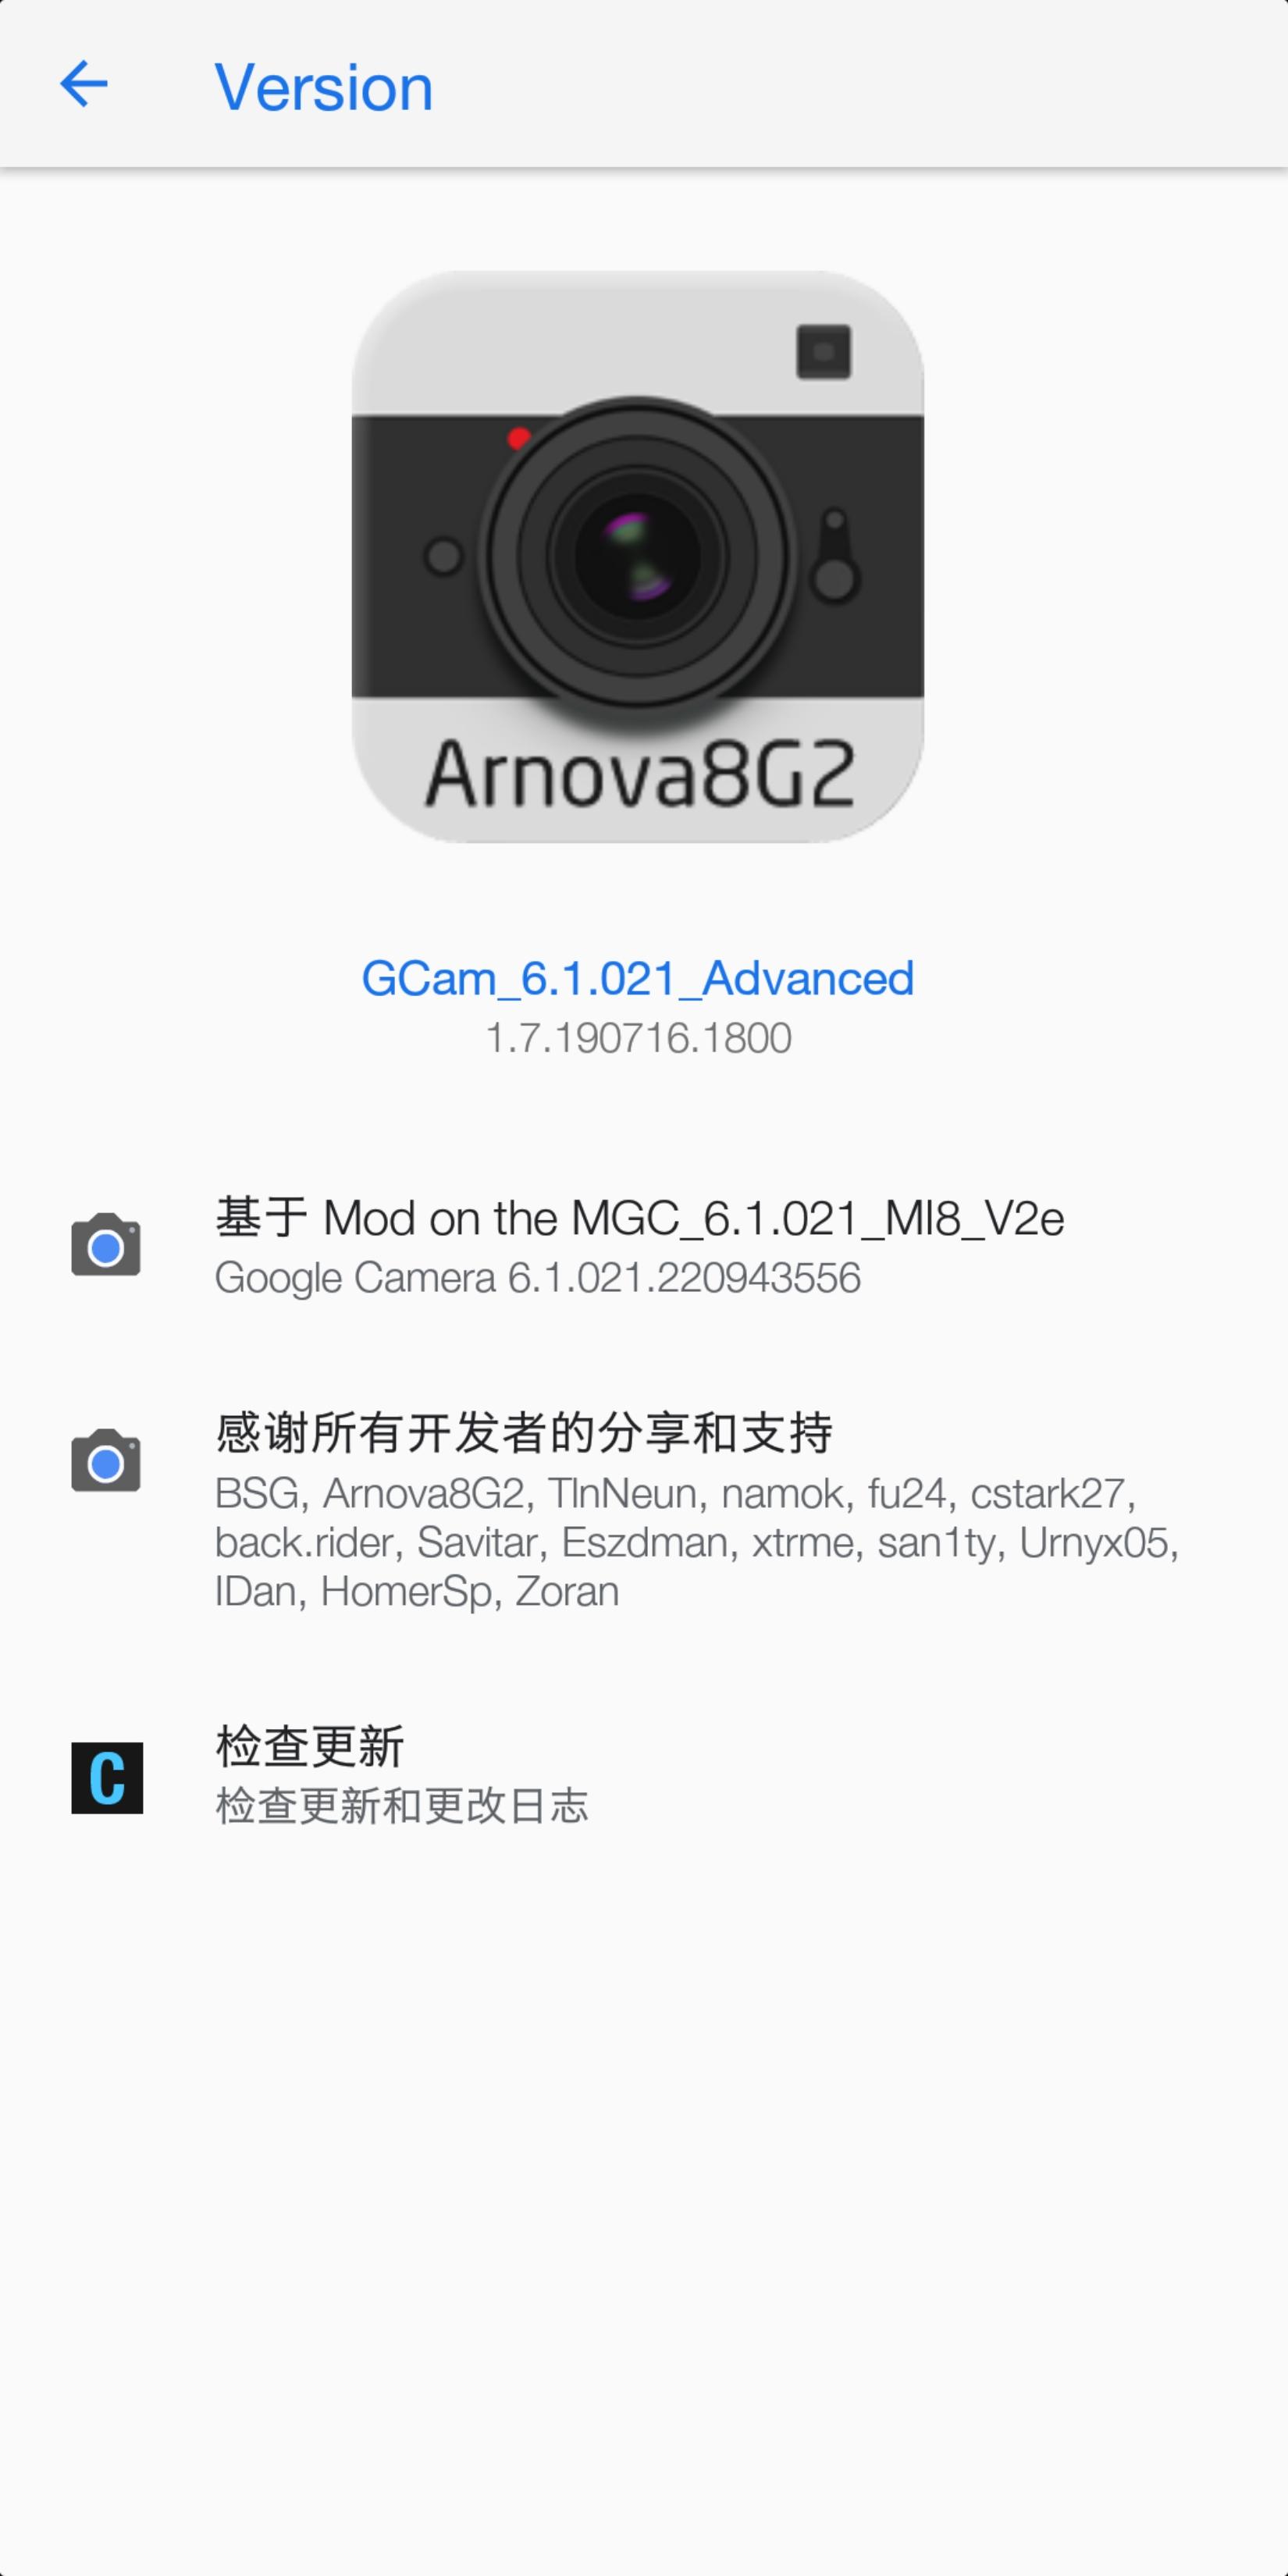 Screenshot_2019-08-12-21-42-58-492_??6.1-v1.7.png